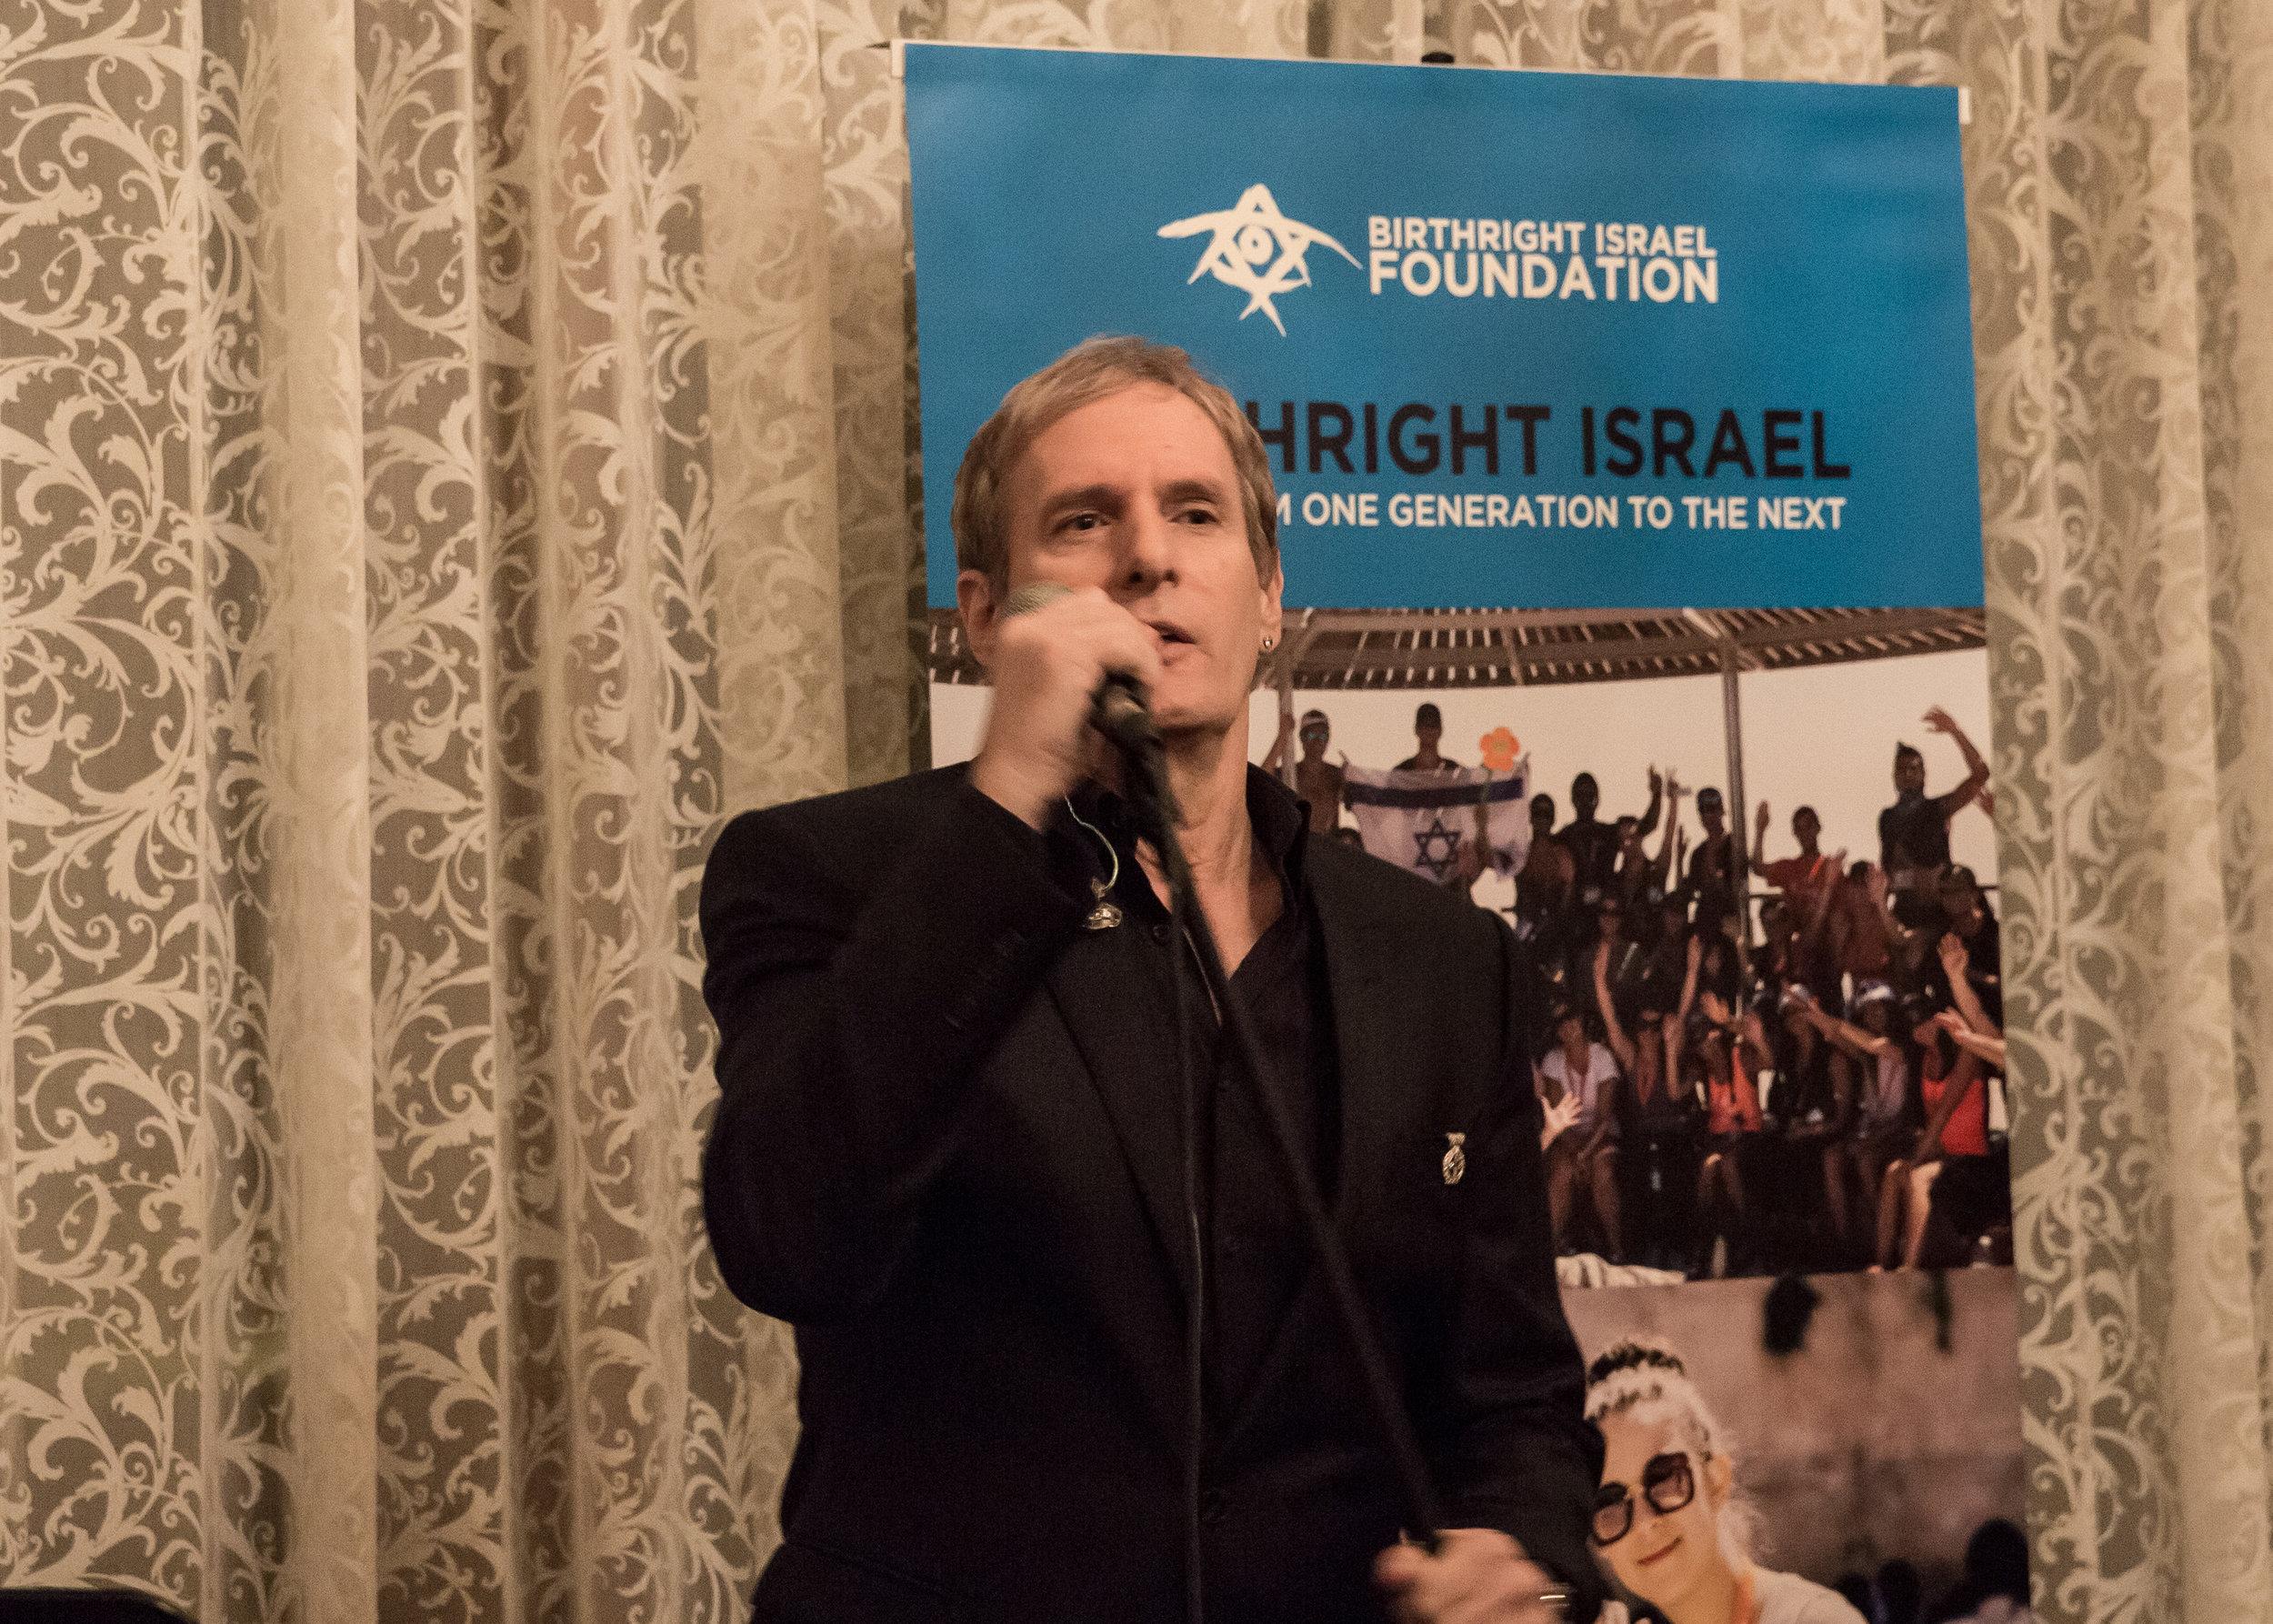 Michael Bolton performing at Birthright Israel Foundation Gala